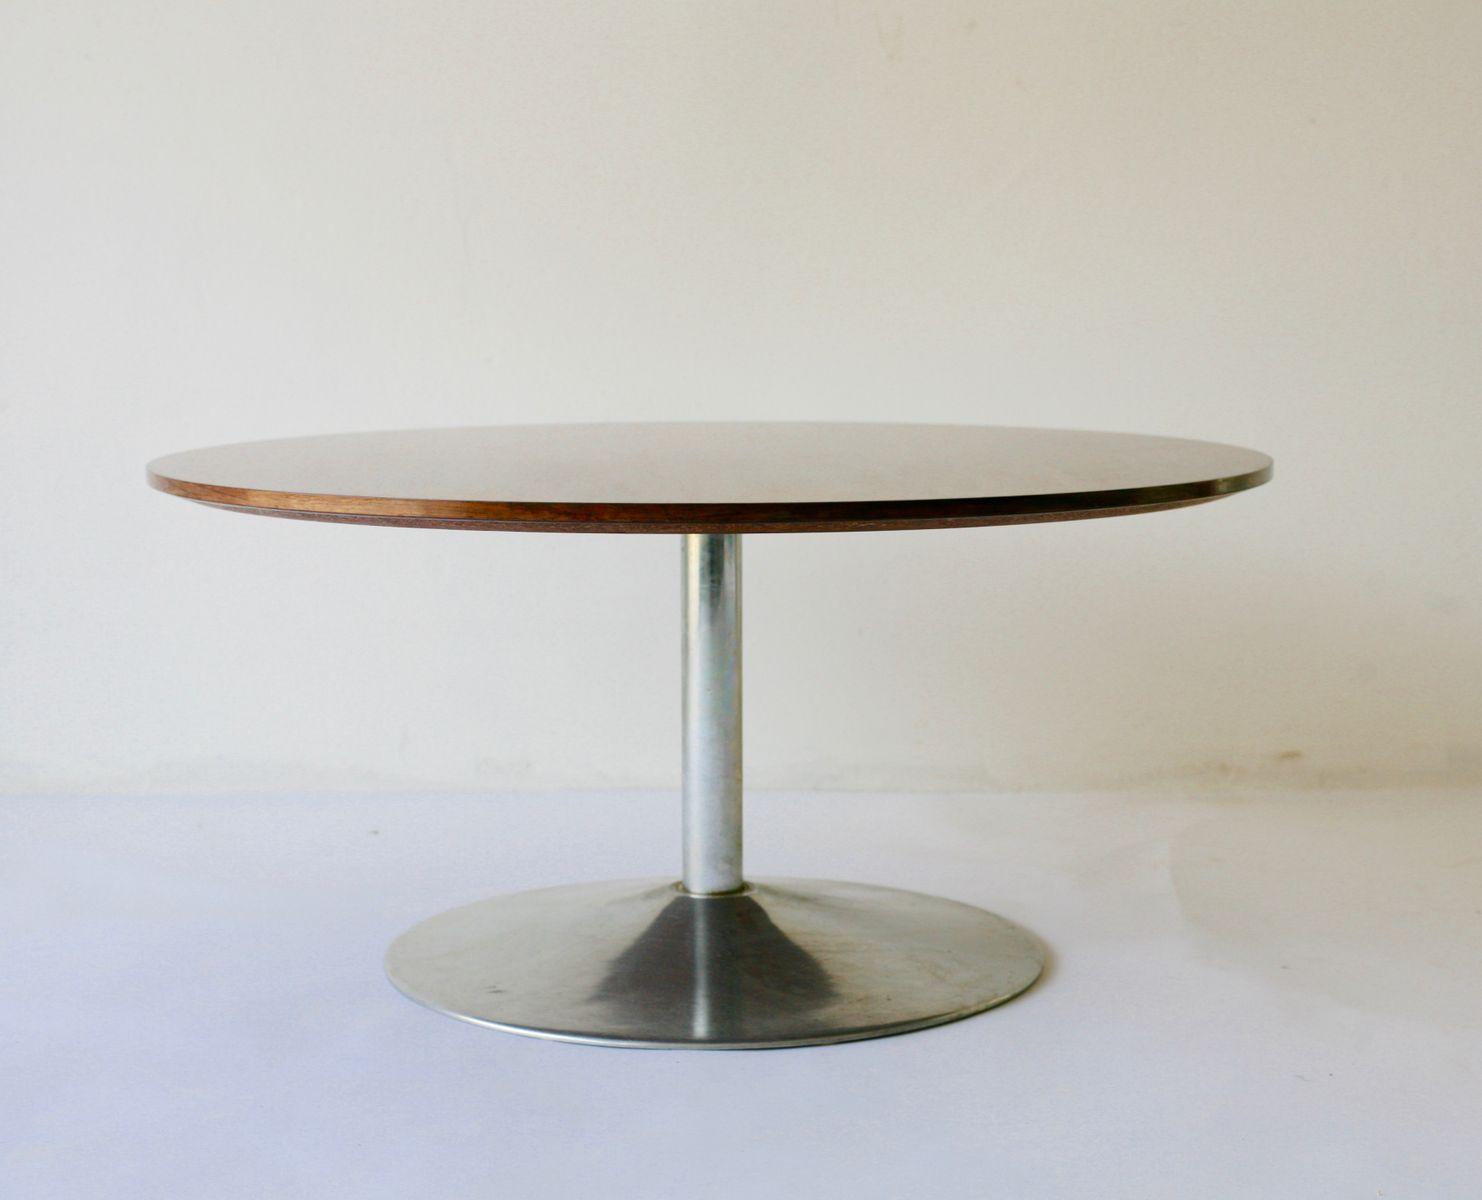 rosewood coffee table by verner panton for fritz hansen. Black Bedroom Furniture Sets. Home Design Ideas